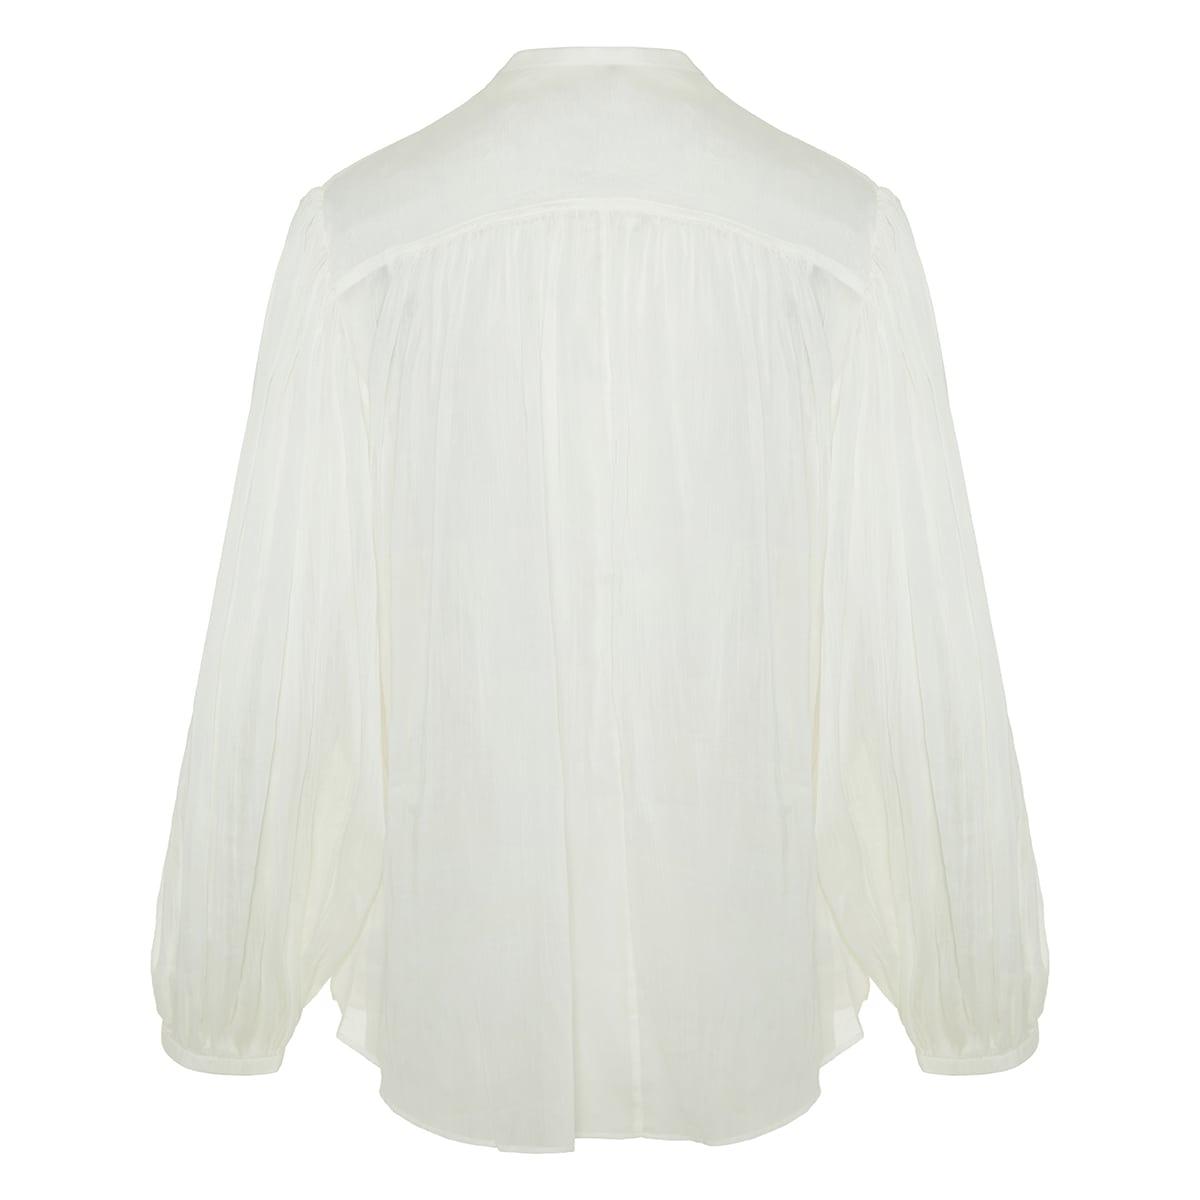 Kiledia balloon-sleeved gathered shirt